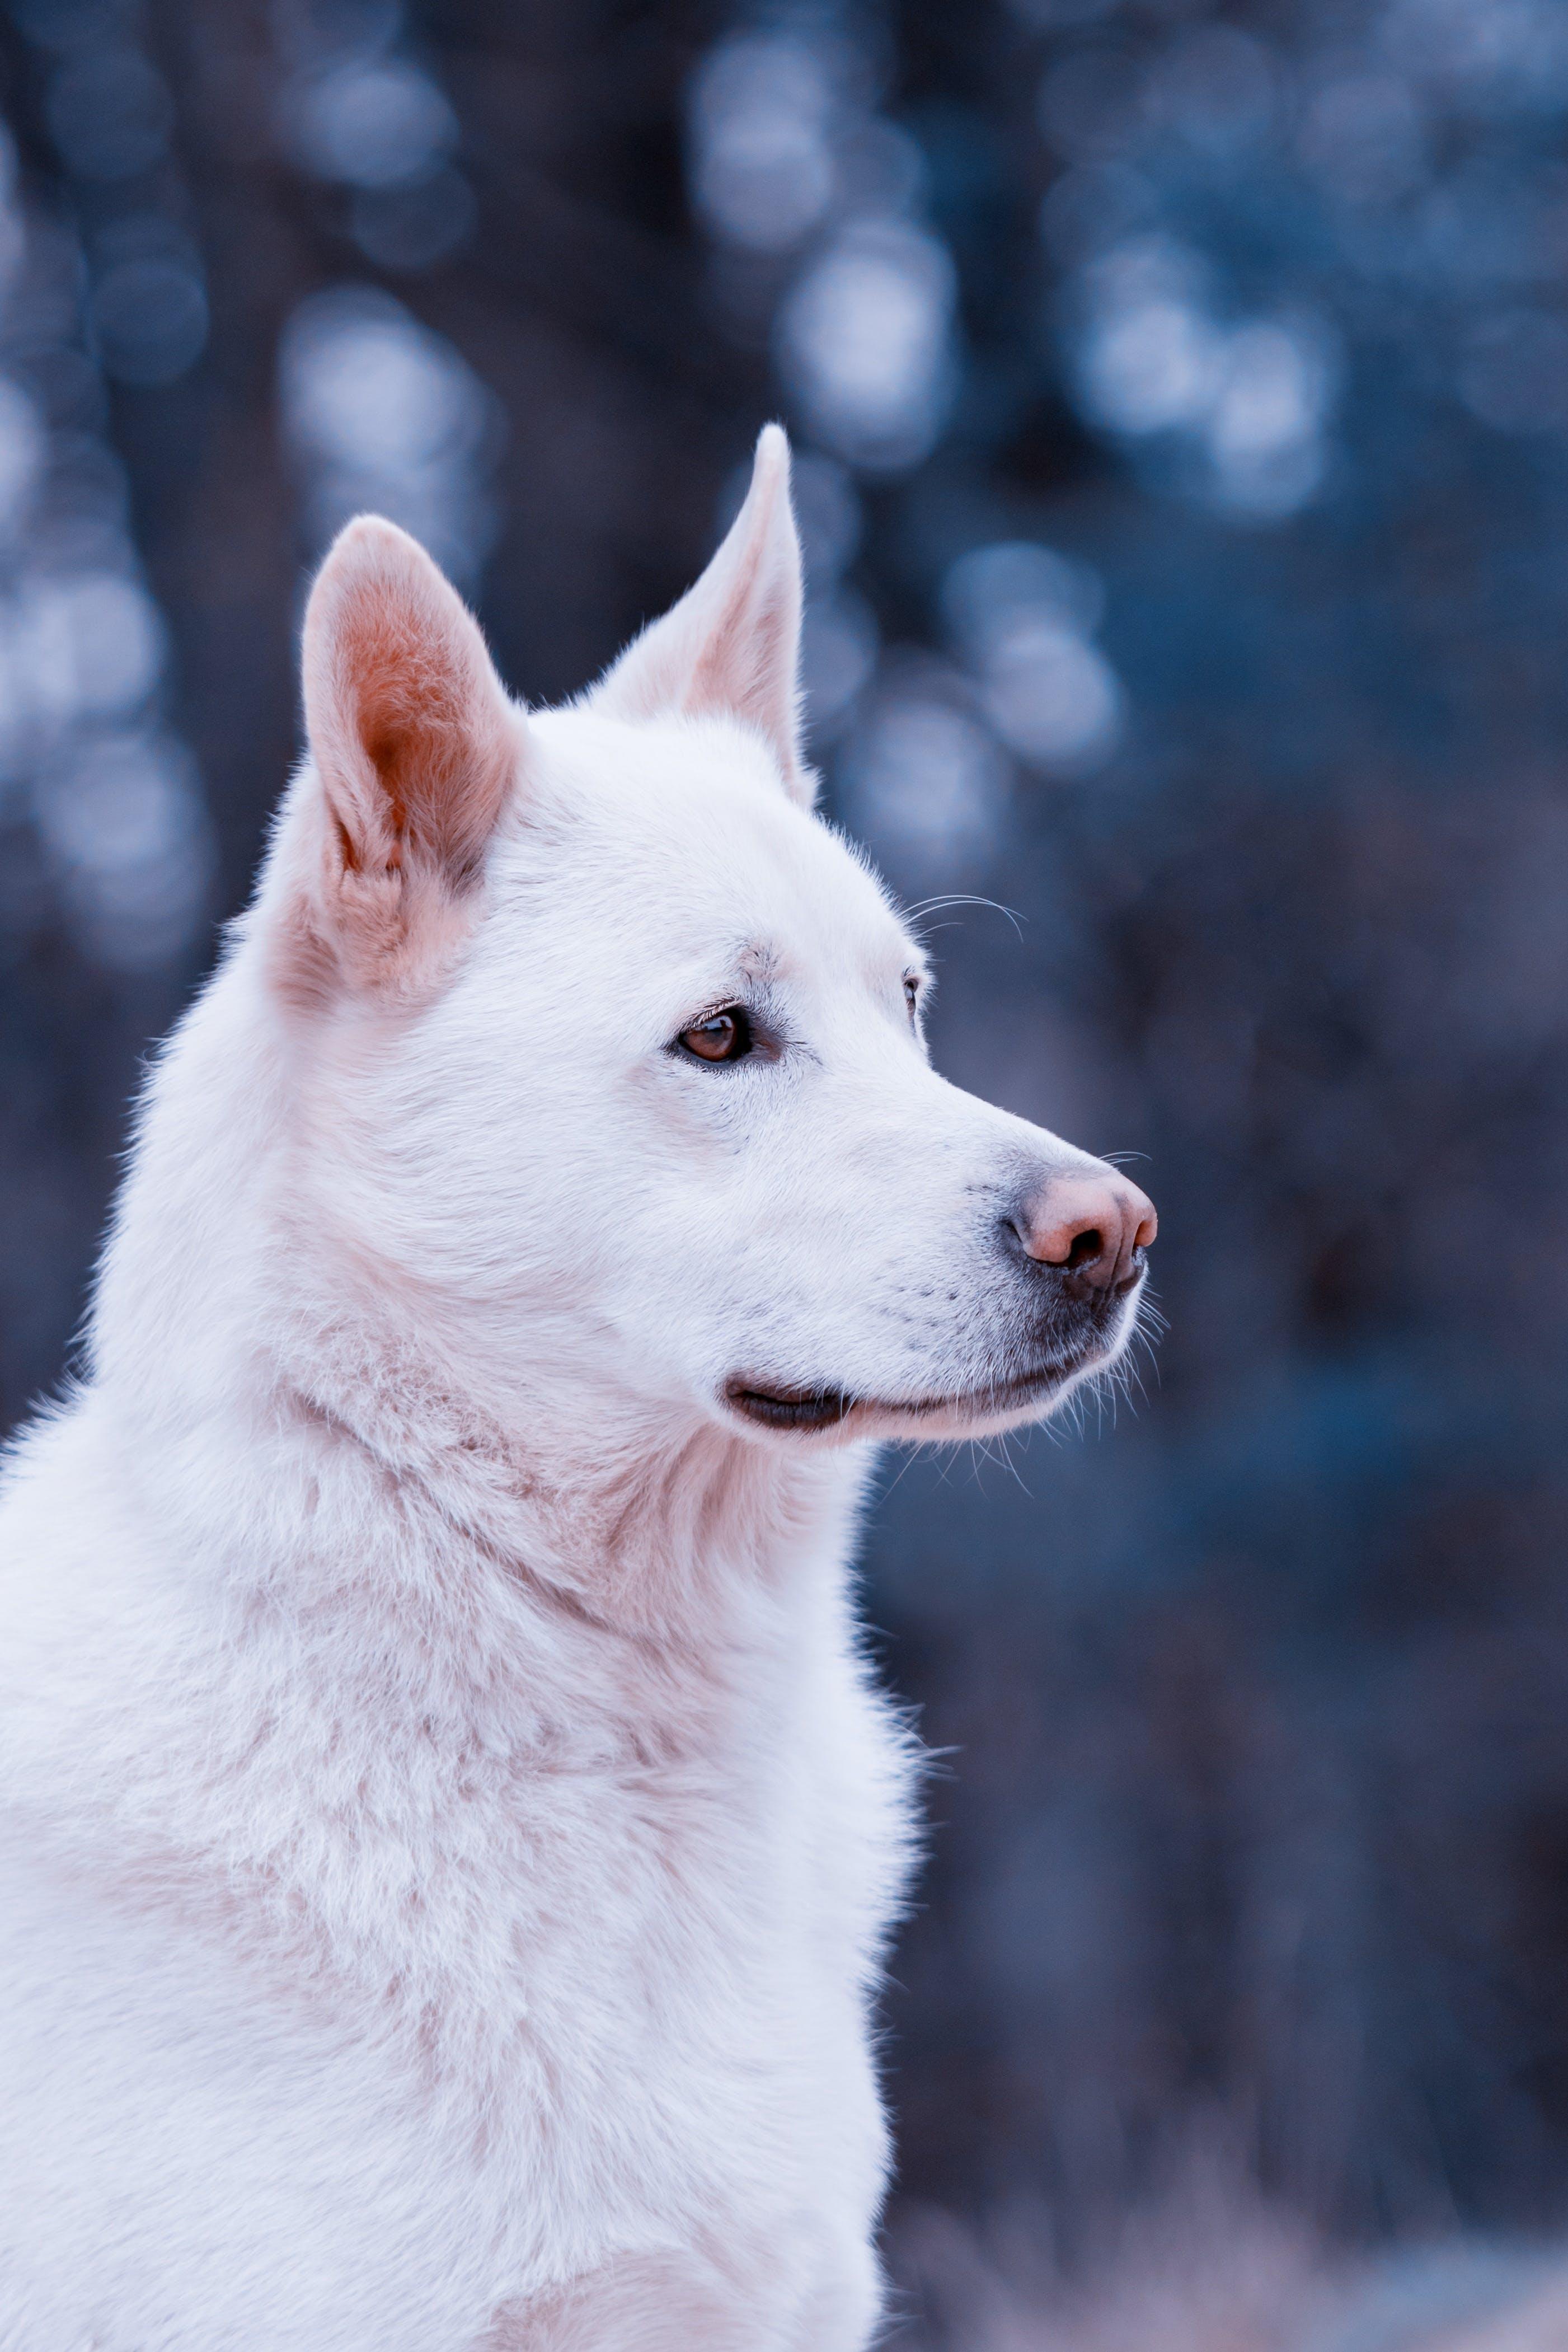 Adult White Shepherd on Selective Focus Photo